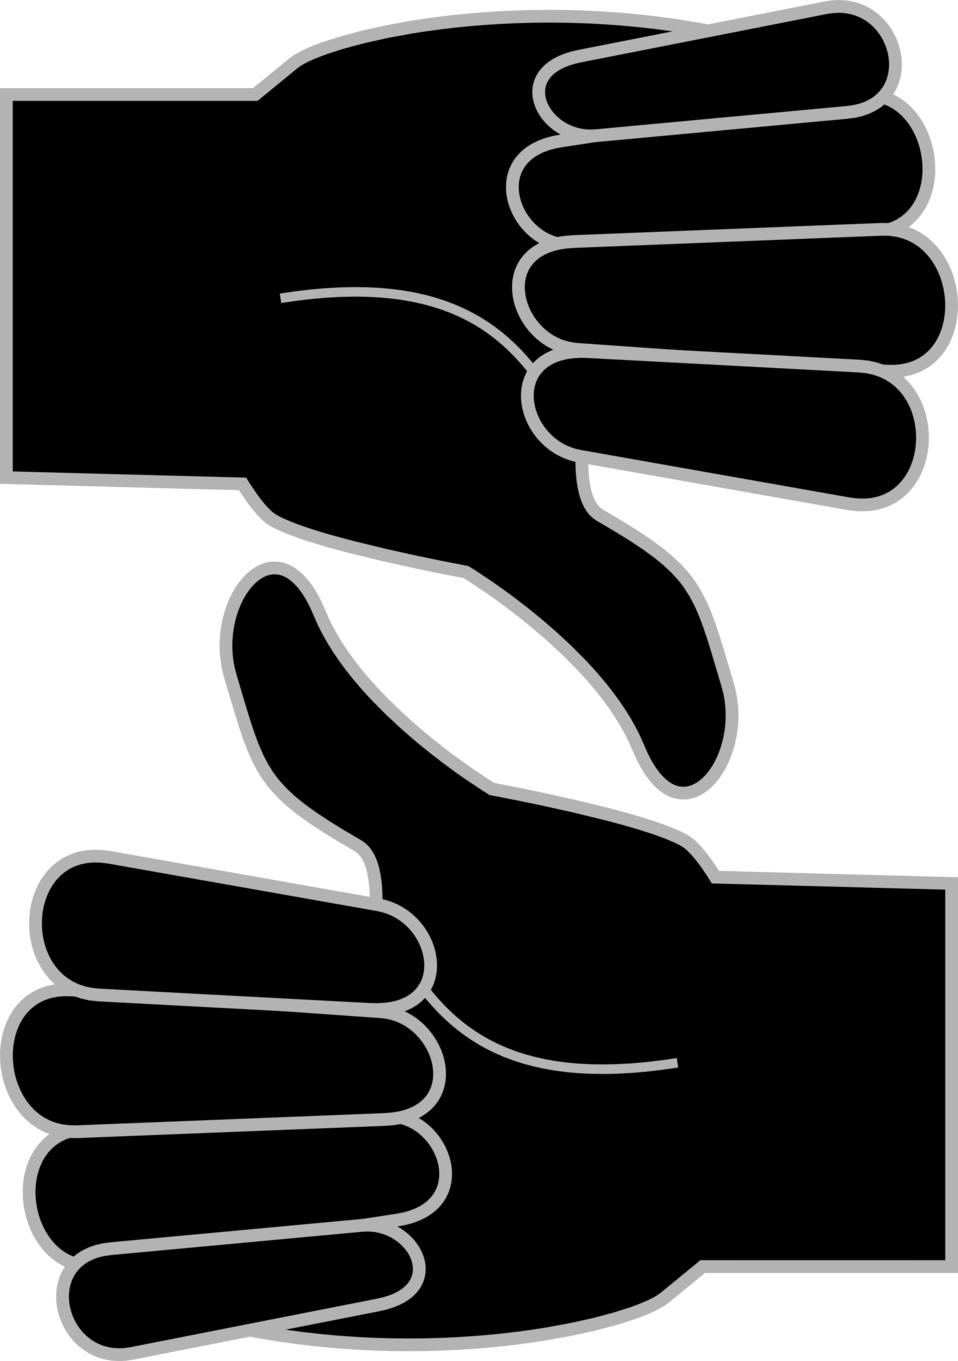 Thumb clipart white glove. Public domain clip art